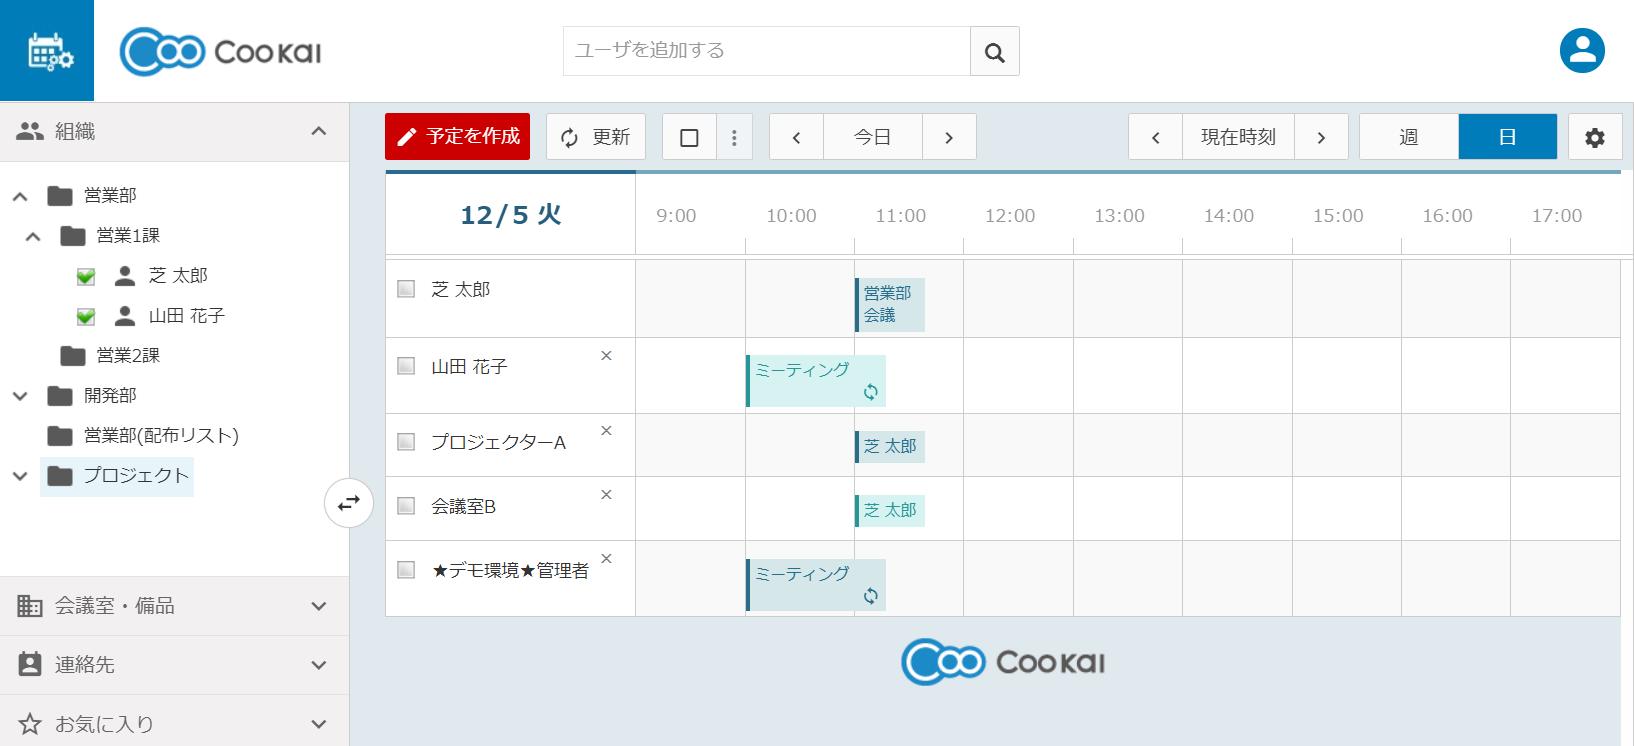 calendar 組織階層型カレンダー cookai クーカイ